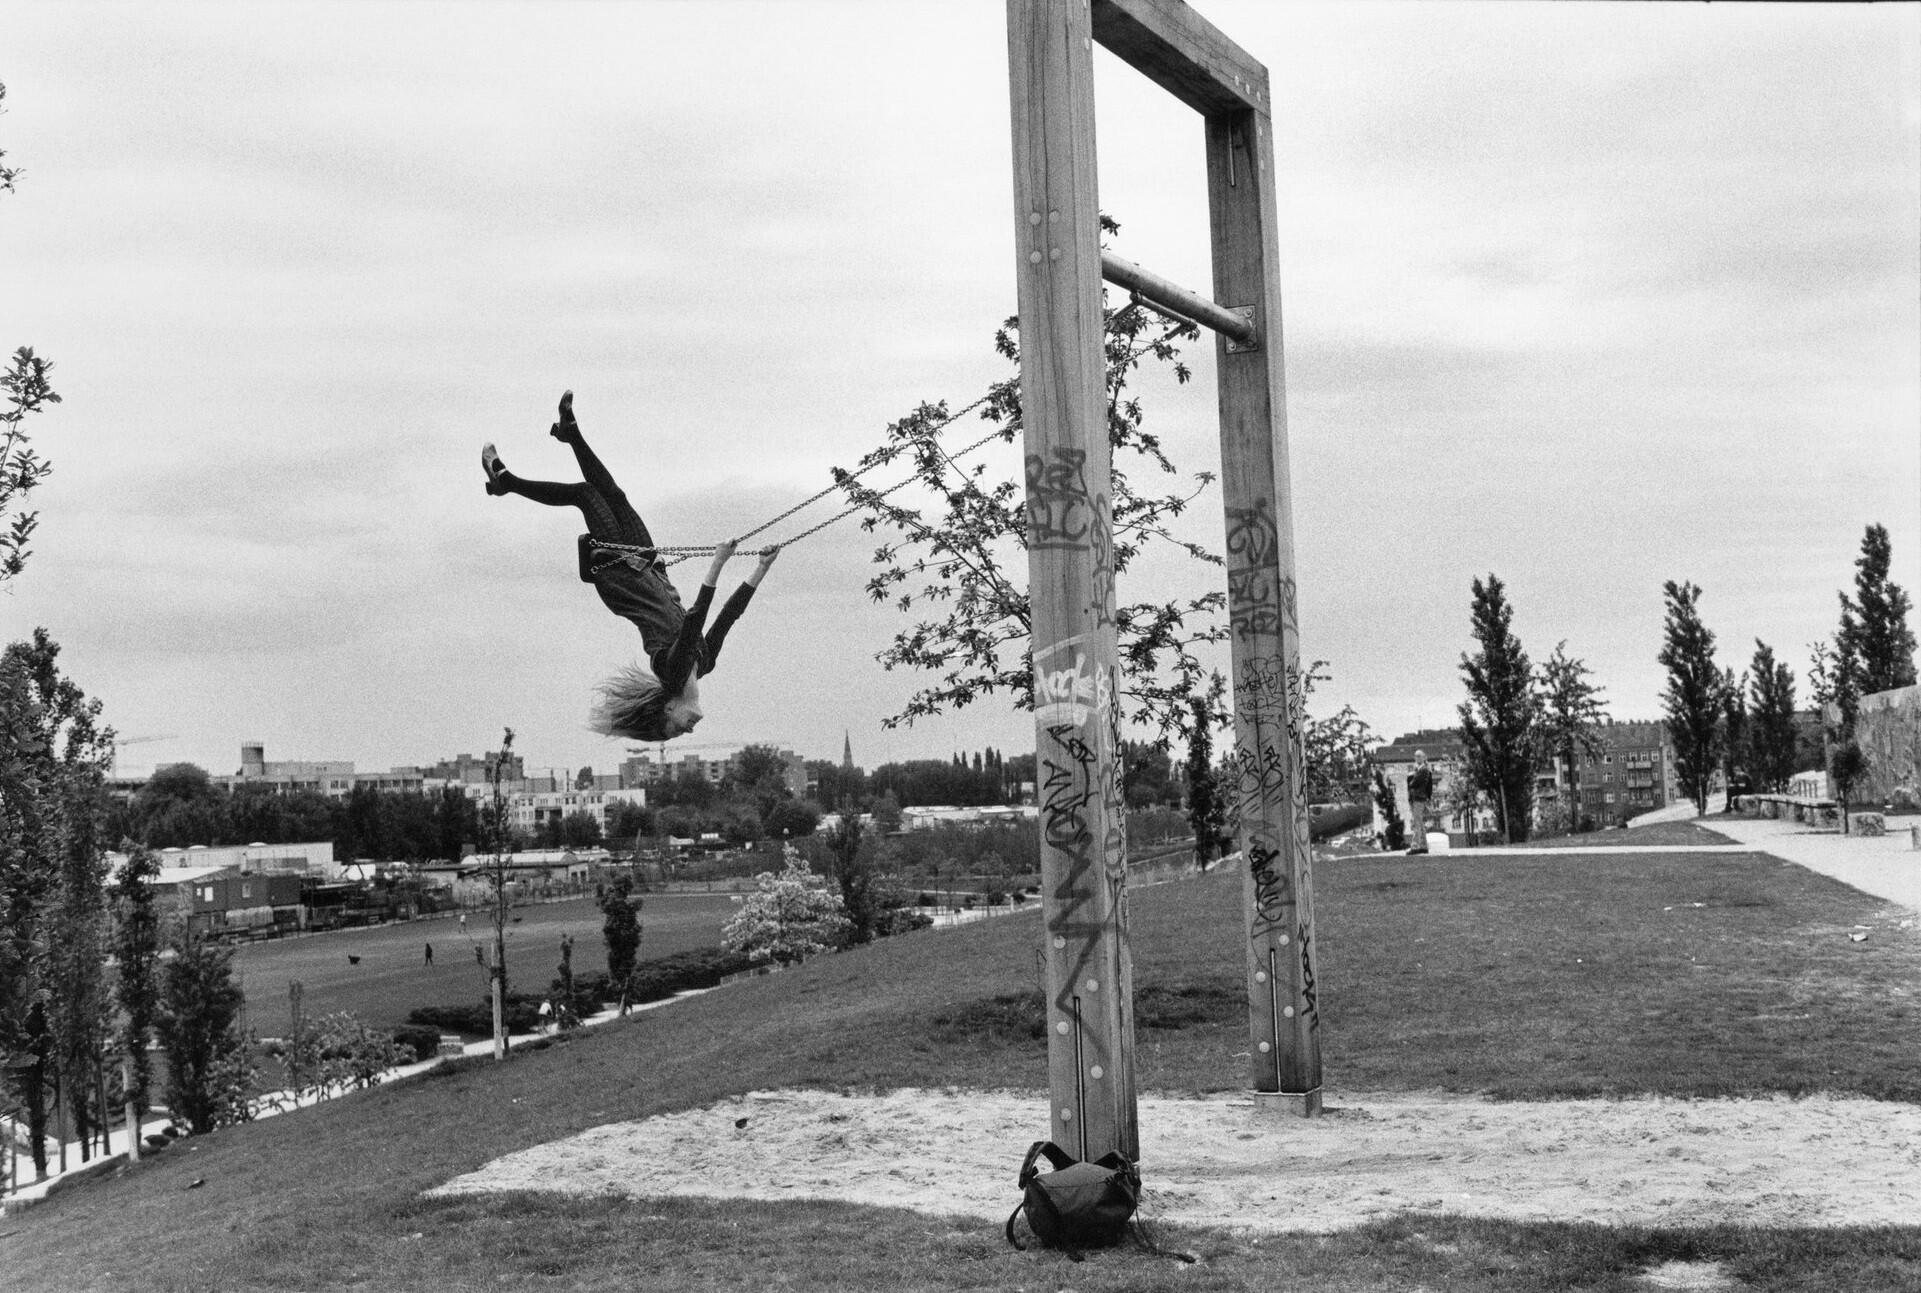 Мауэрпарк, Берлин, из серии «Восточный Берлин 1972-1996», 1996 год. Фотограф Сибилла Бергеман